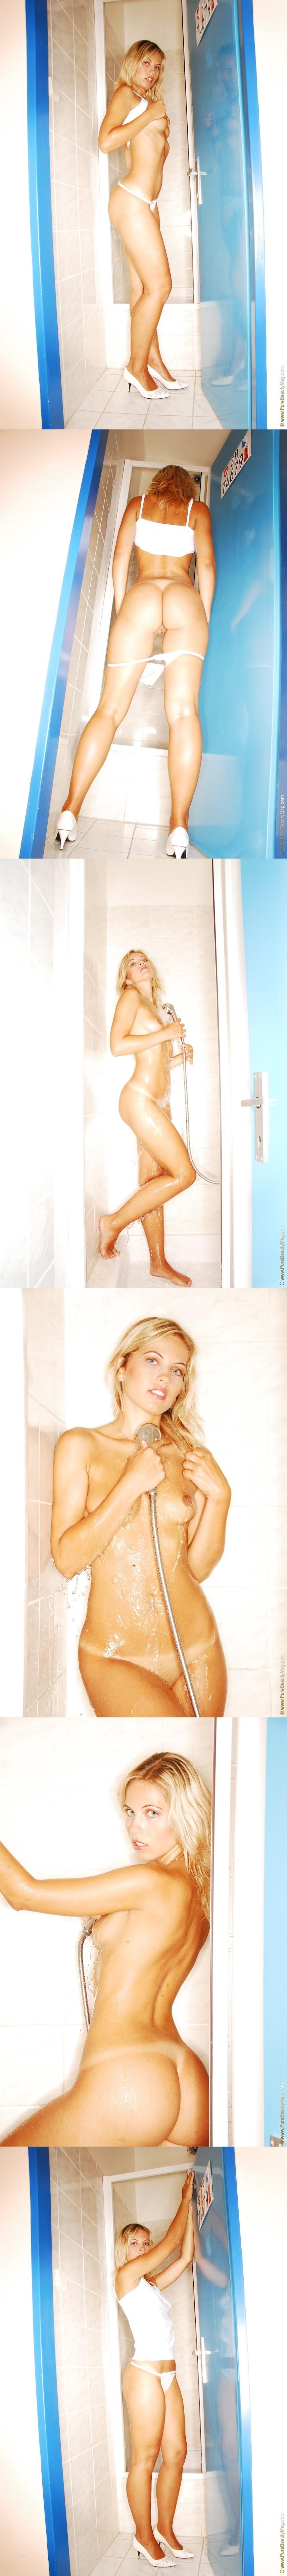 PureBeautyMag PBM  - 2006-10-01 - #s272604 - Jenny C - Behind - 3872px - idols